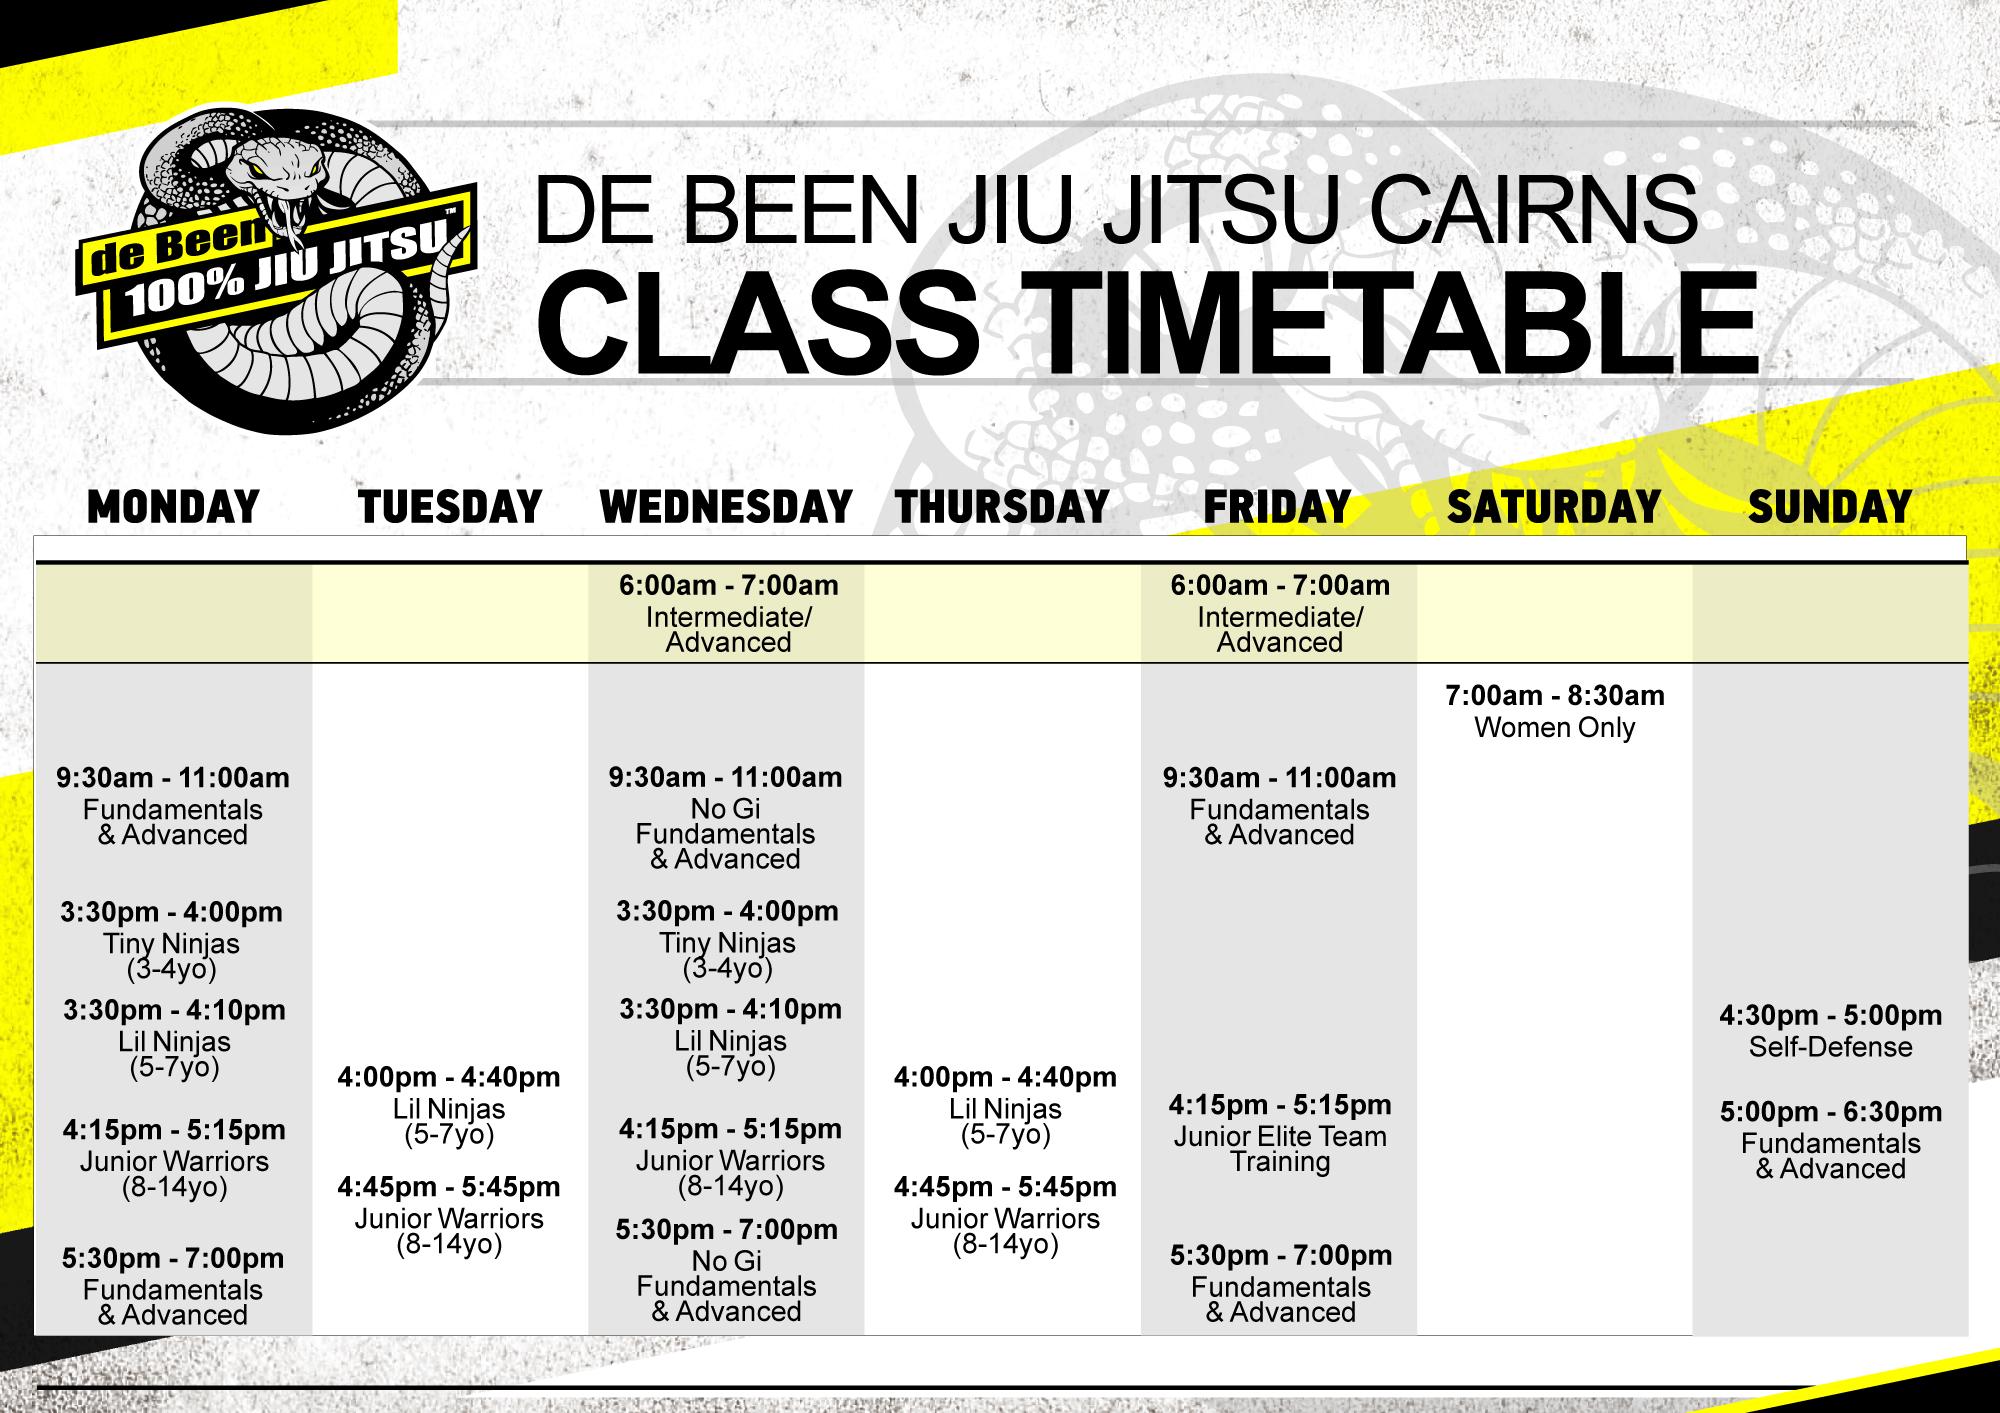 dBJJcairns-Timetable.jpg